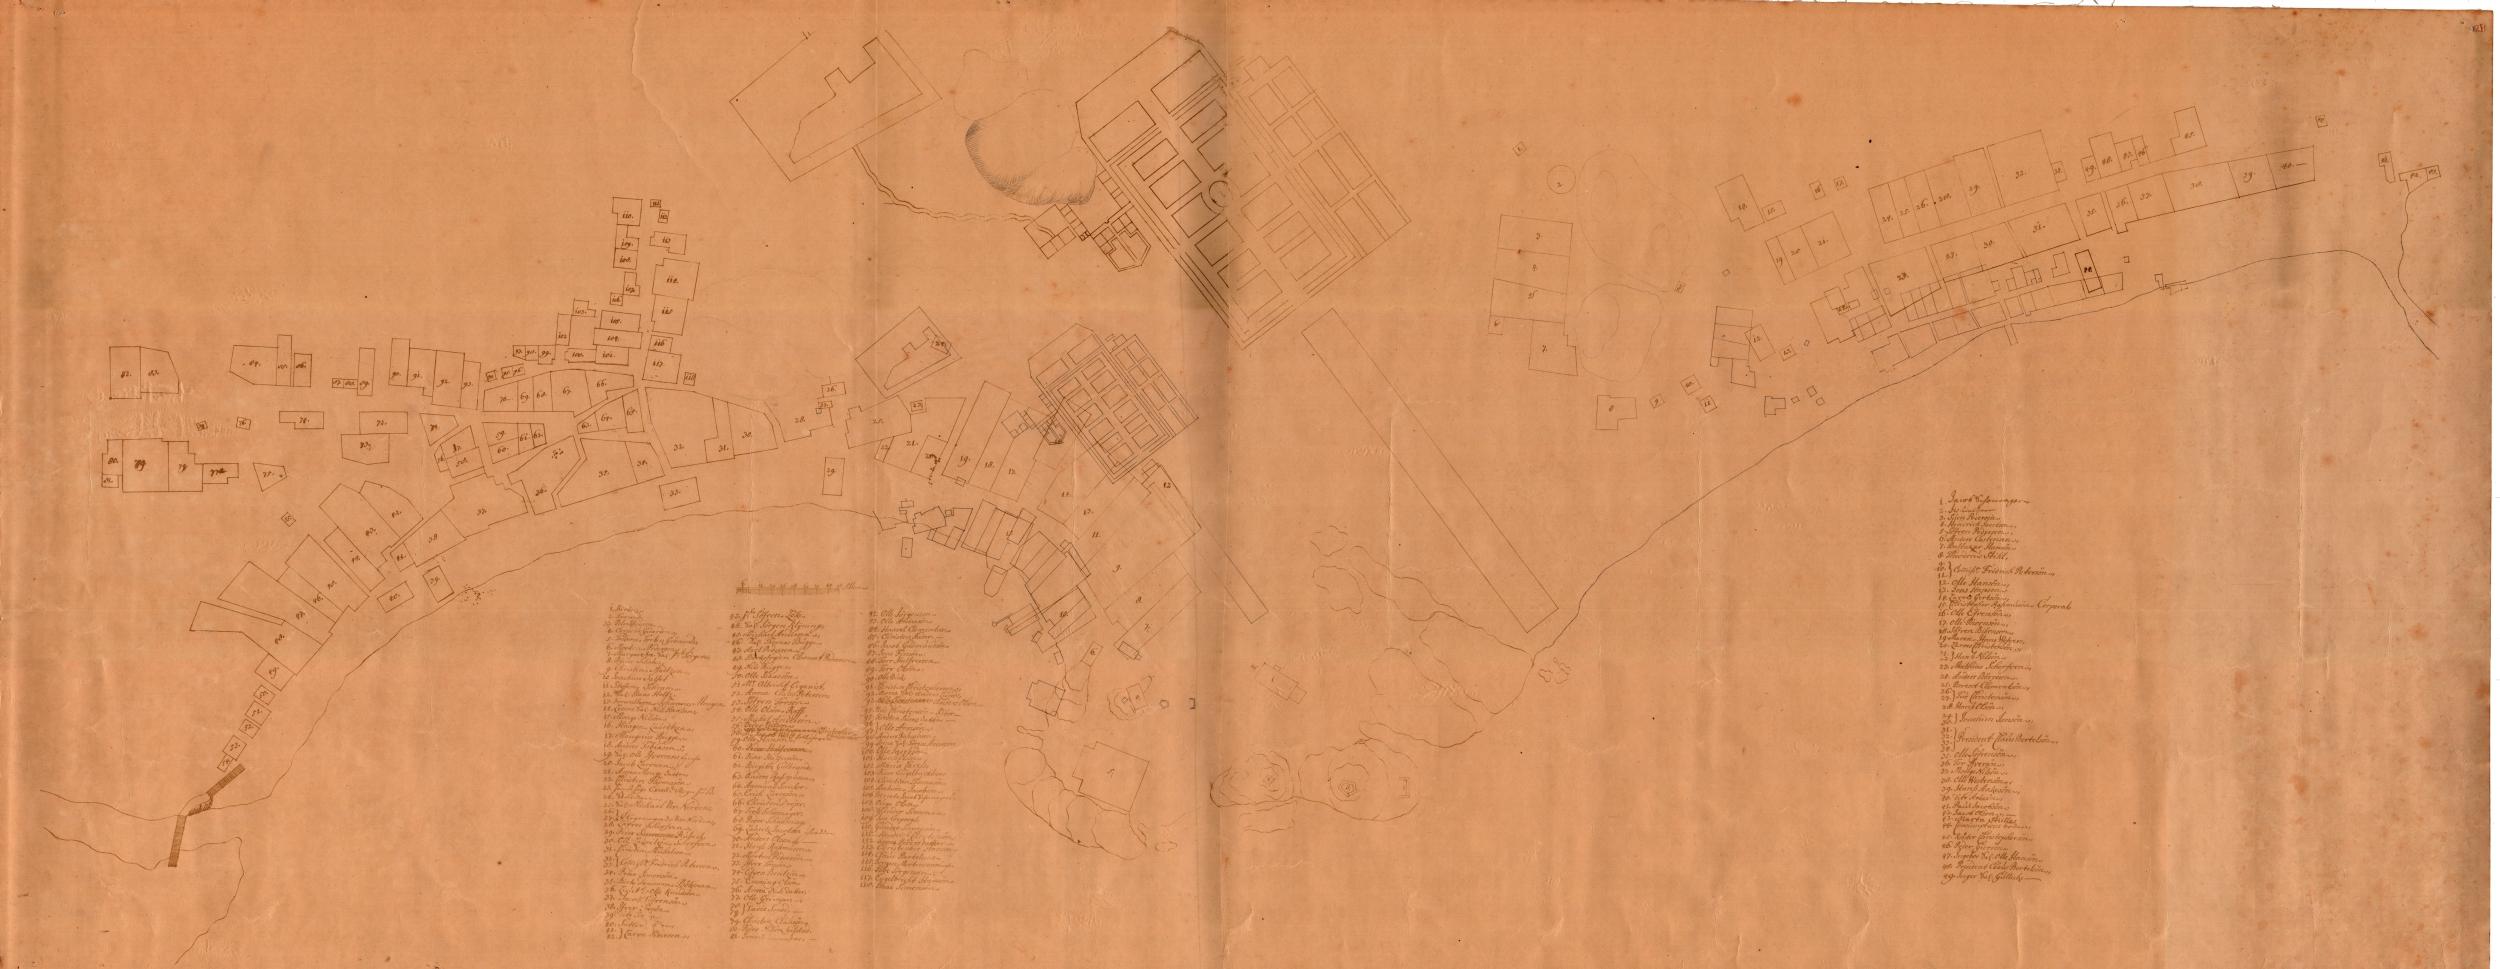 Plan Larviku datowany na 1688 rok